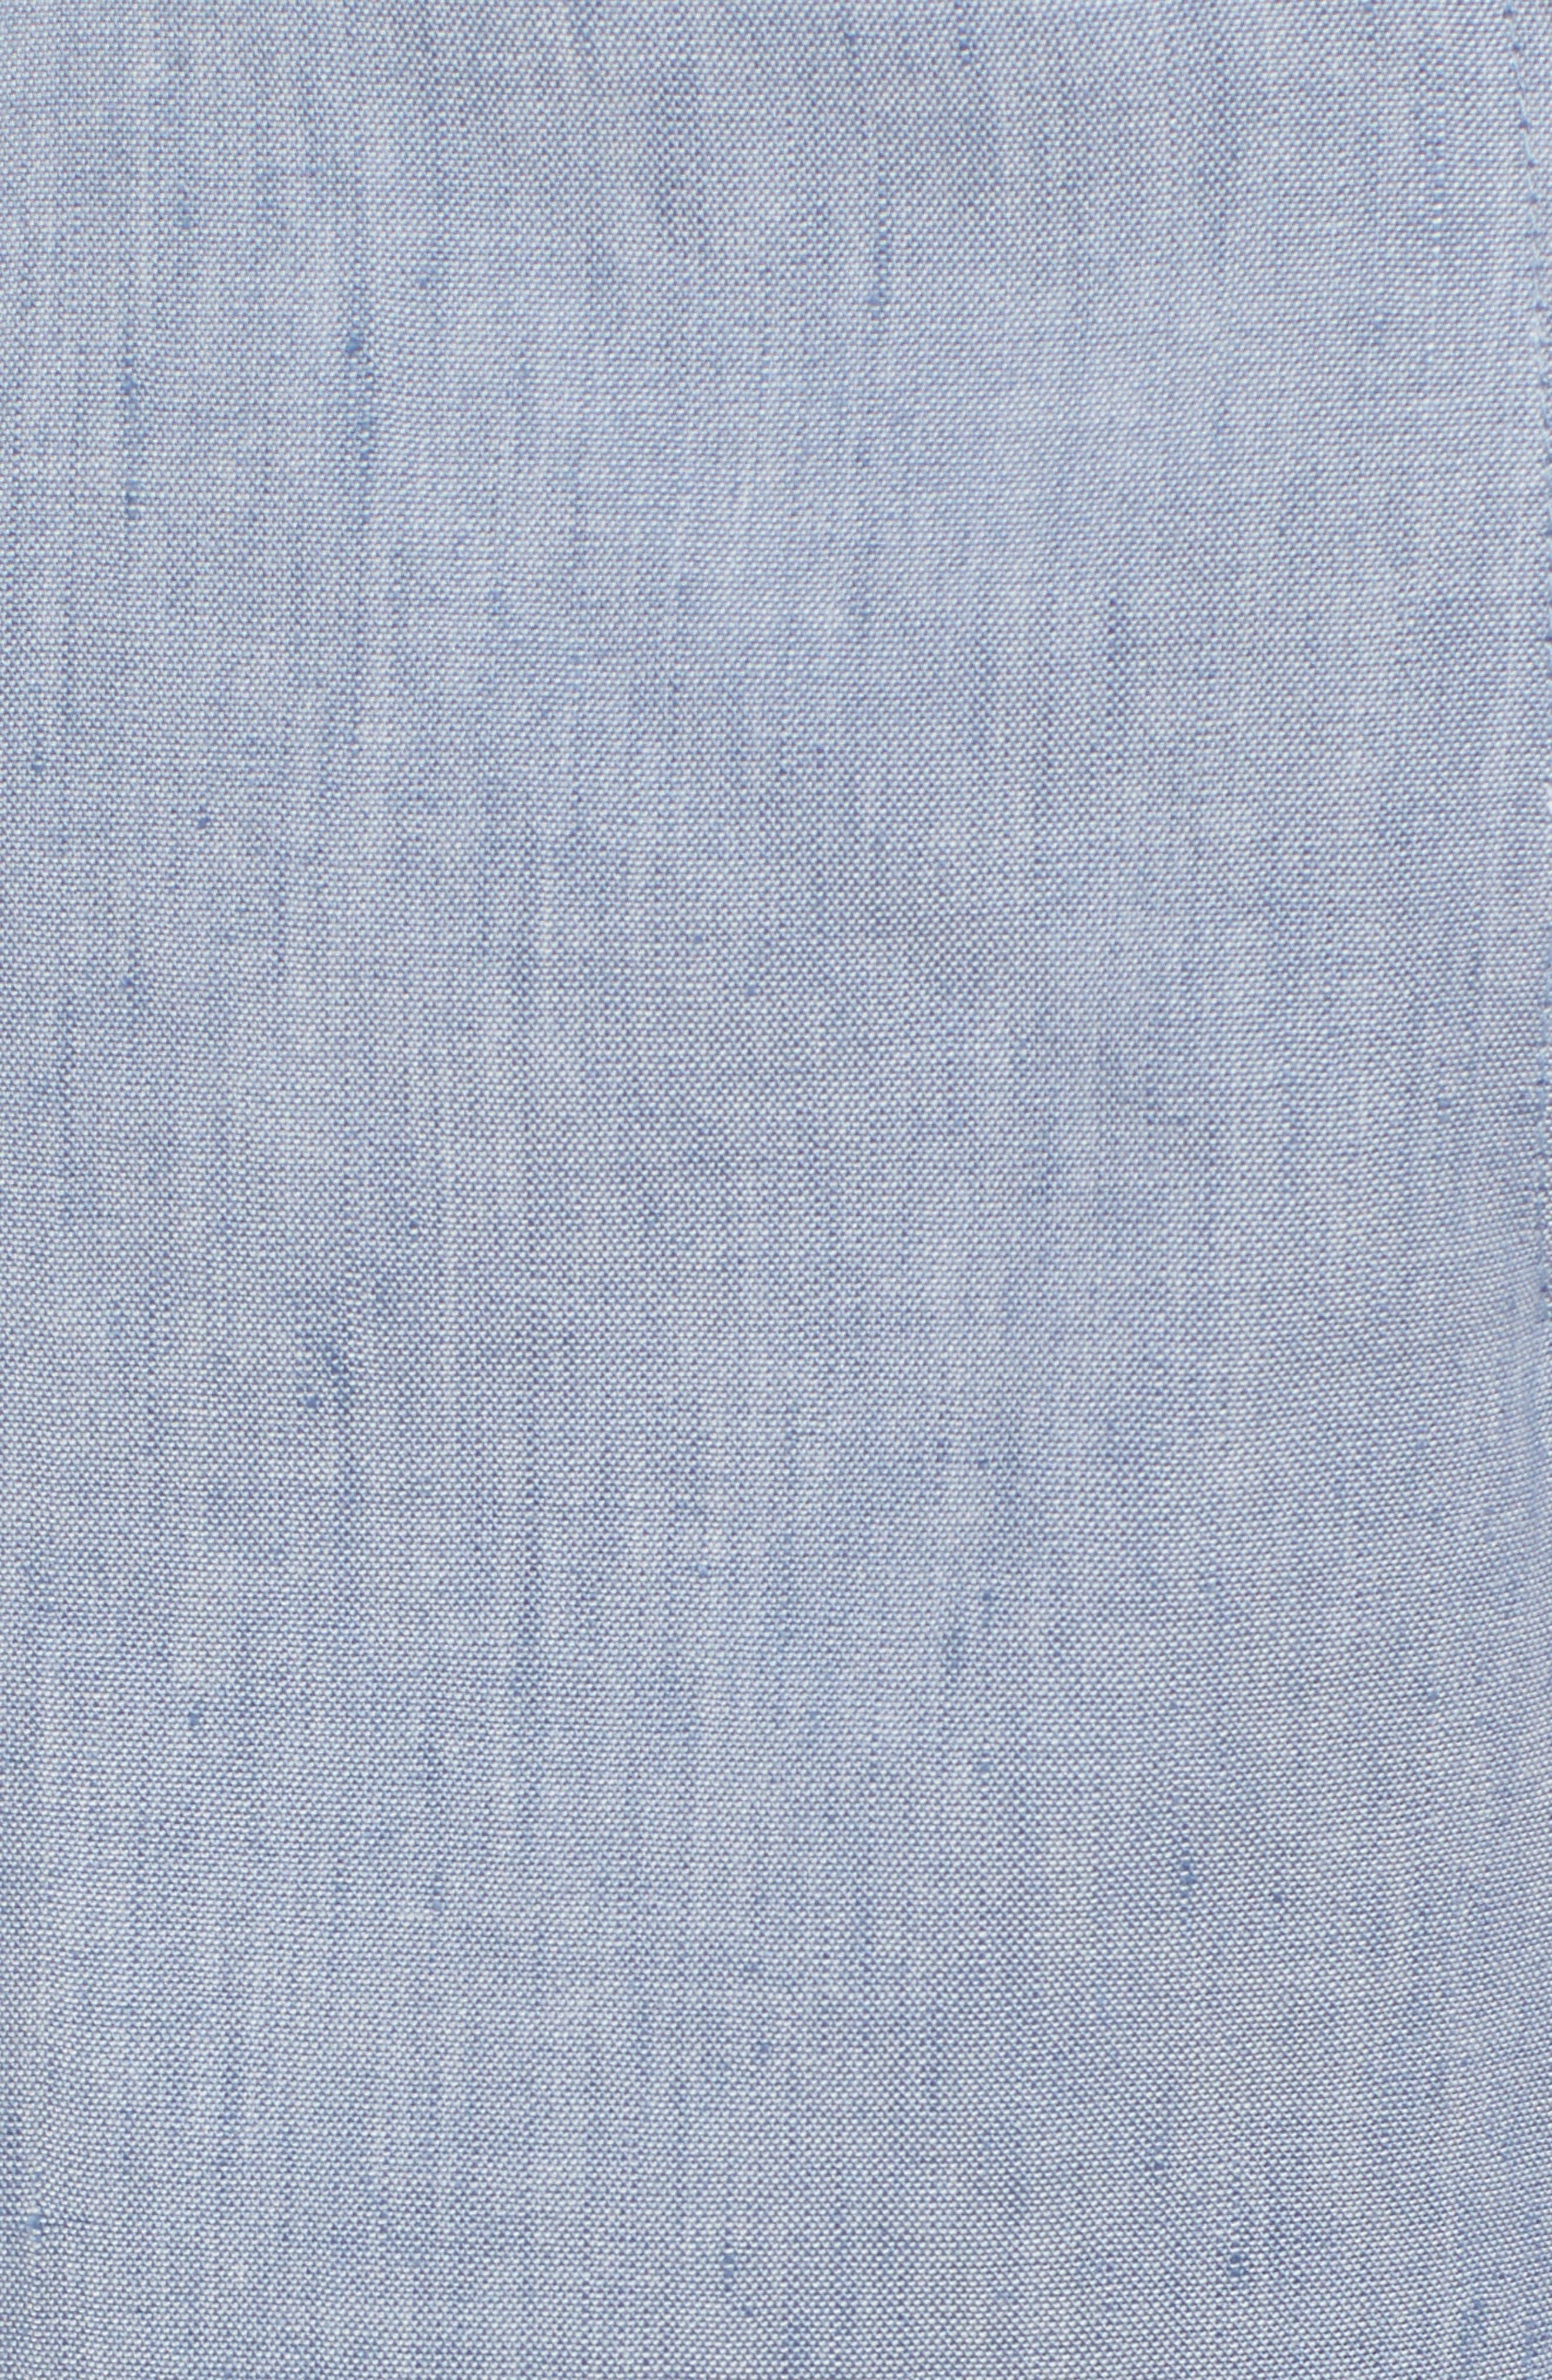 Wide Leg Linen Blend Pants,                             Alternate thumbnail 6, color,                             Chambray